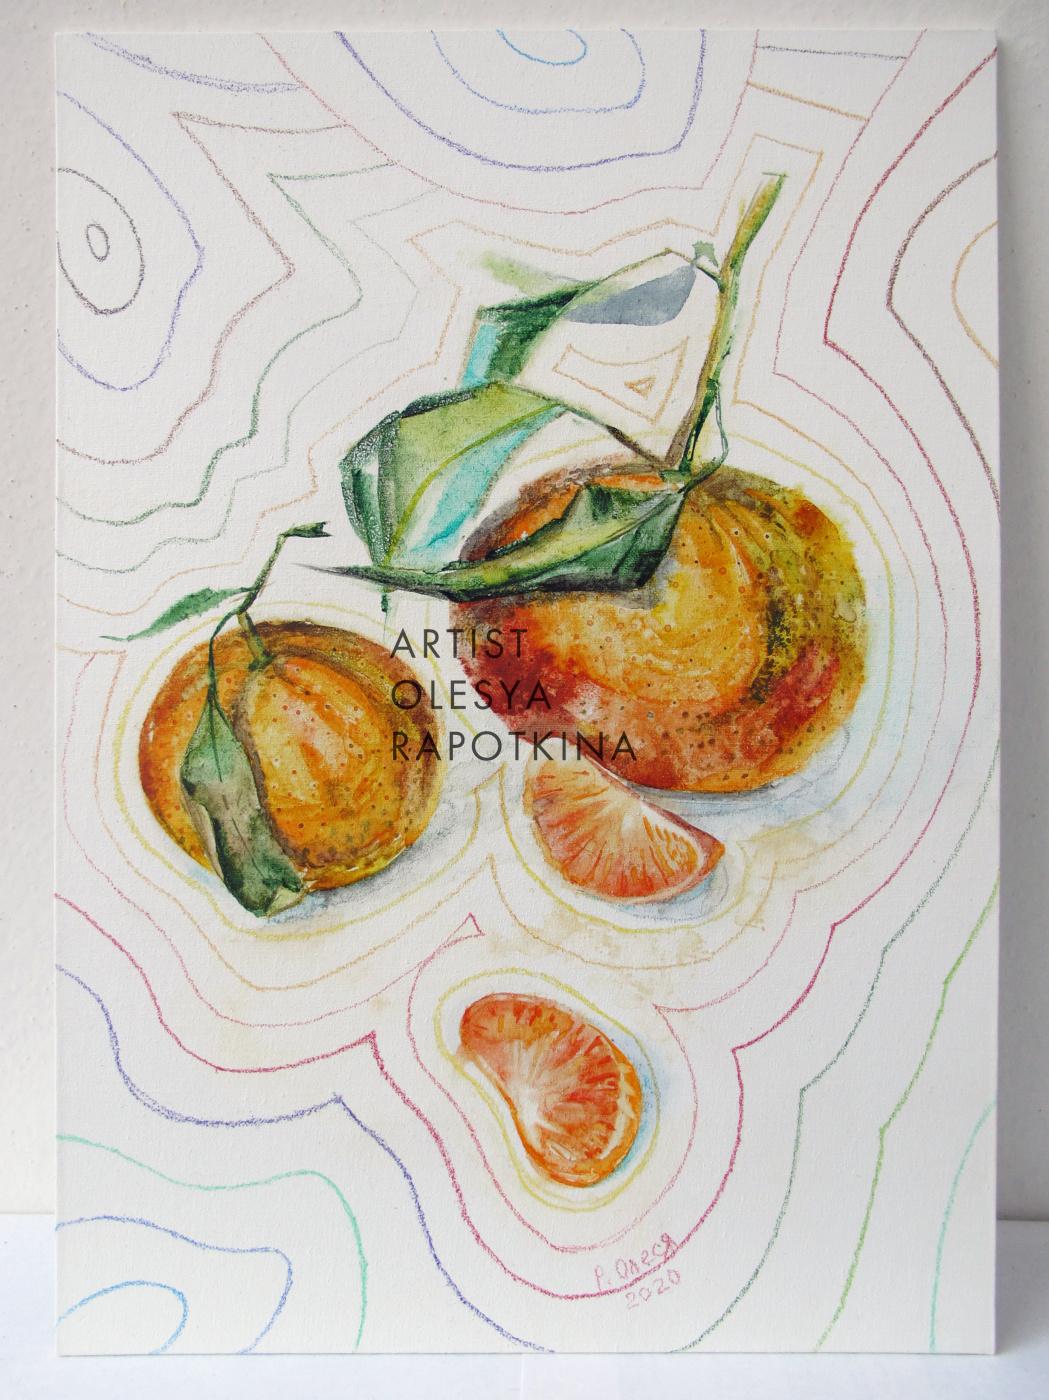 Olesya Rapotkina. Merry tangerines